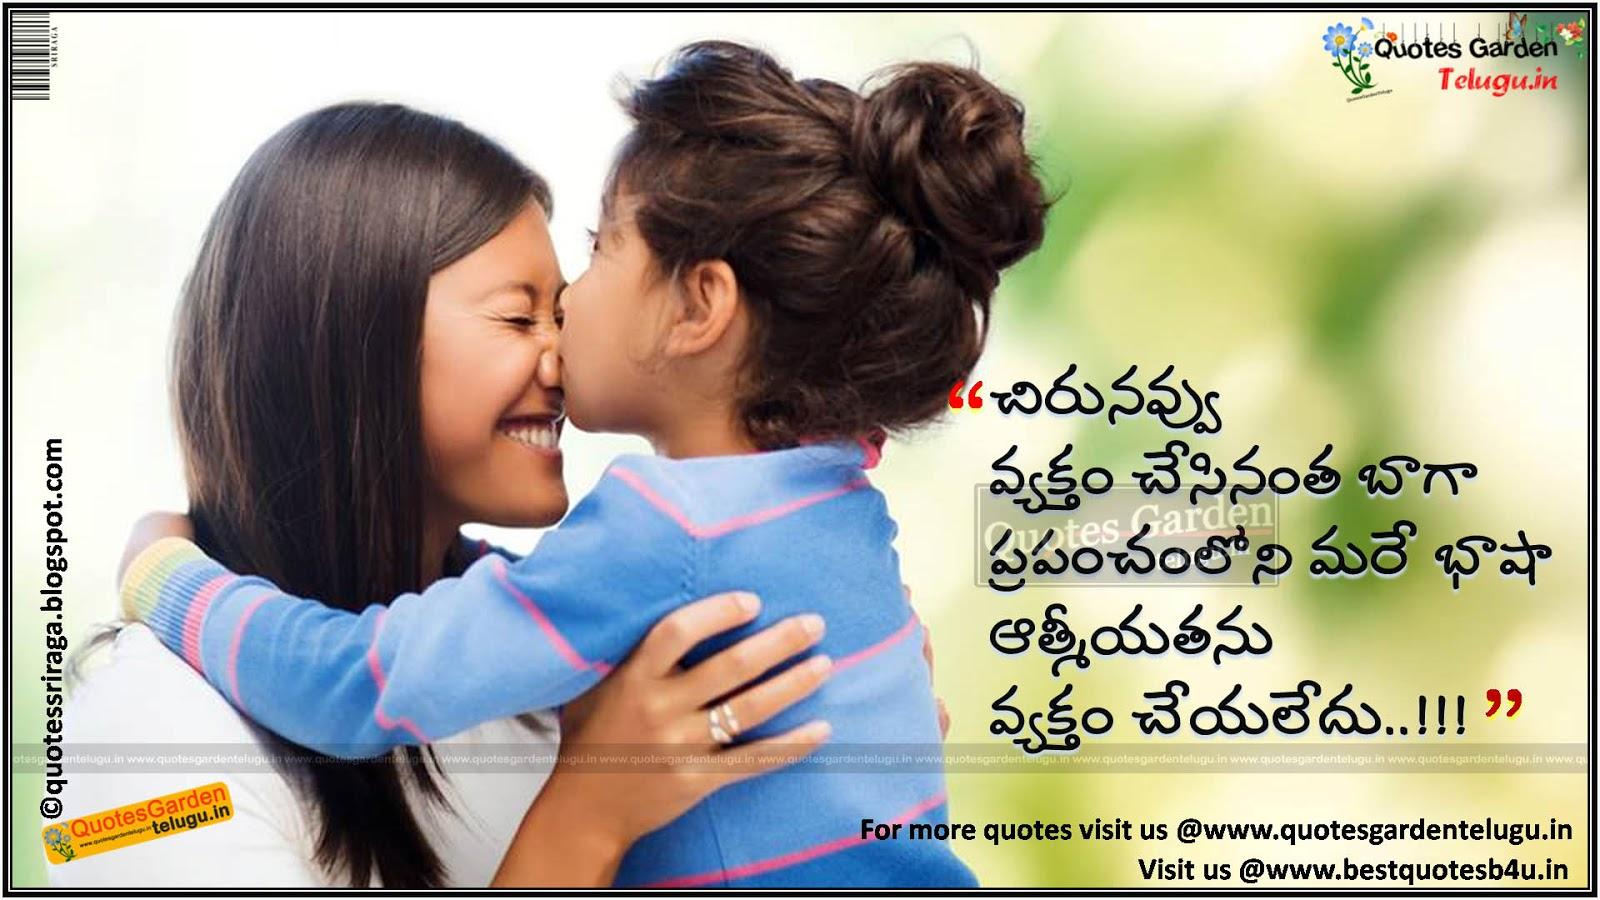 quotations on smile in telugu - photo #22